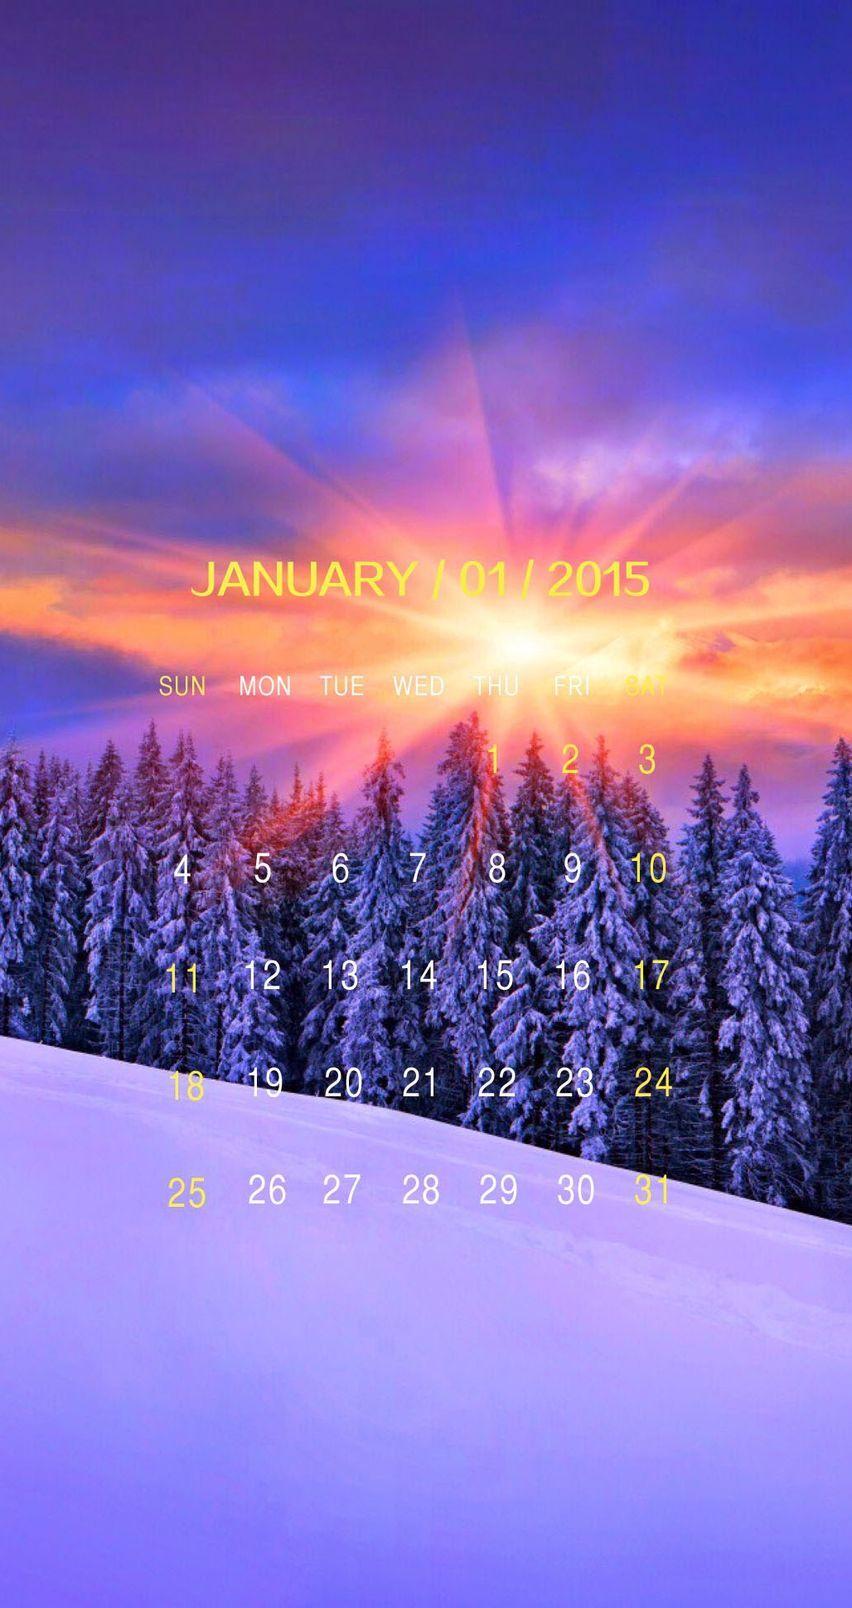 9 Beautiful iPhone Calendar Wallpapers for JANUARY